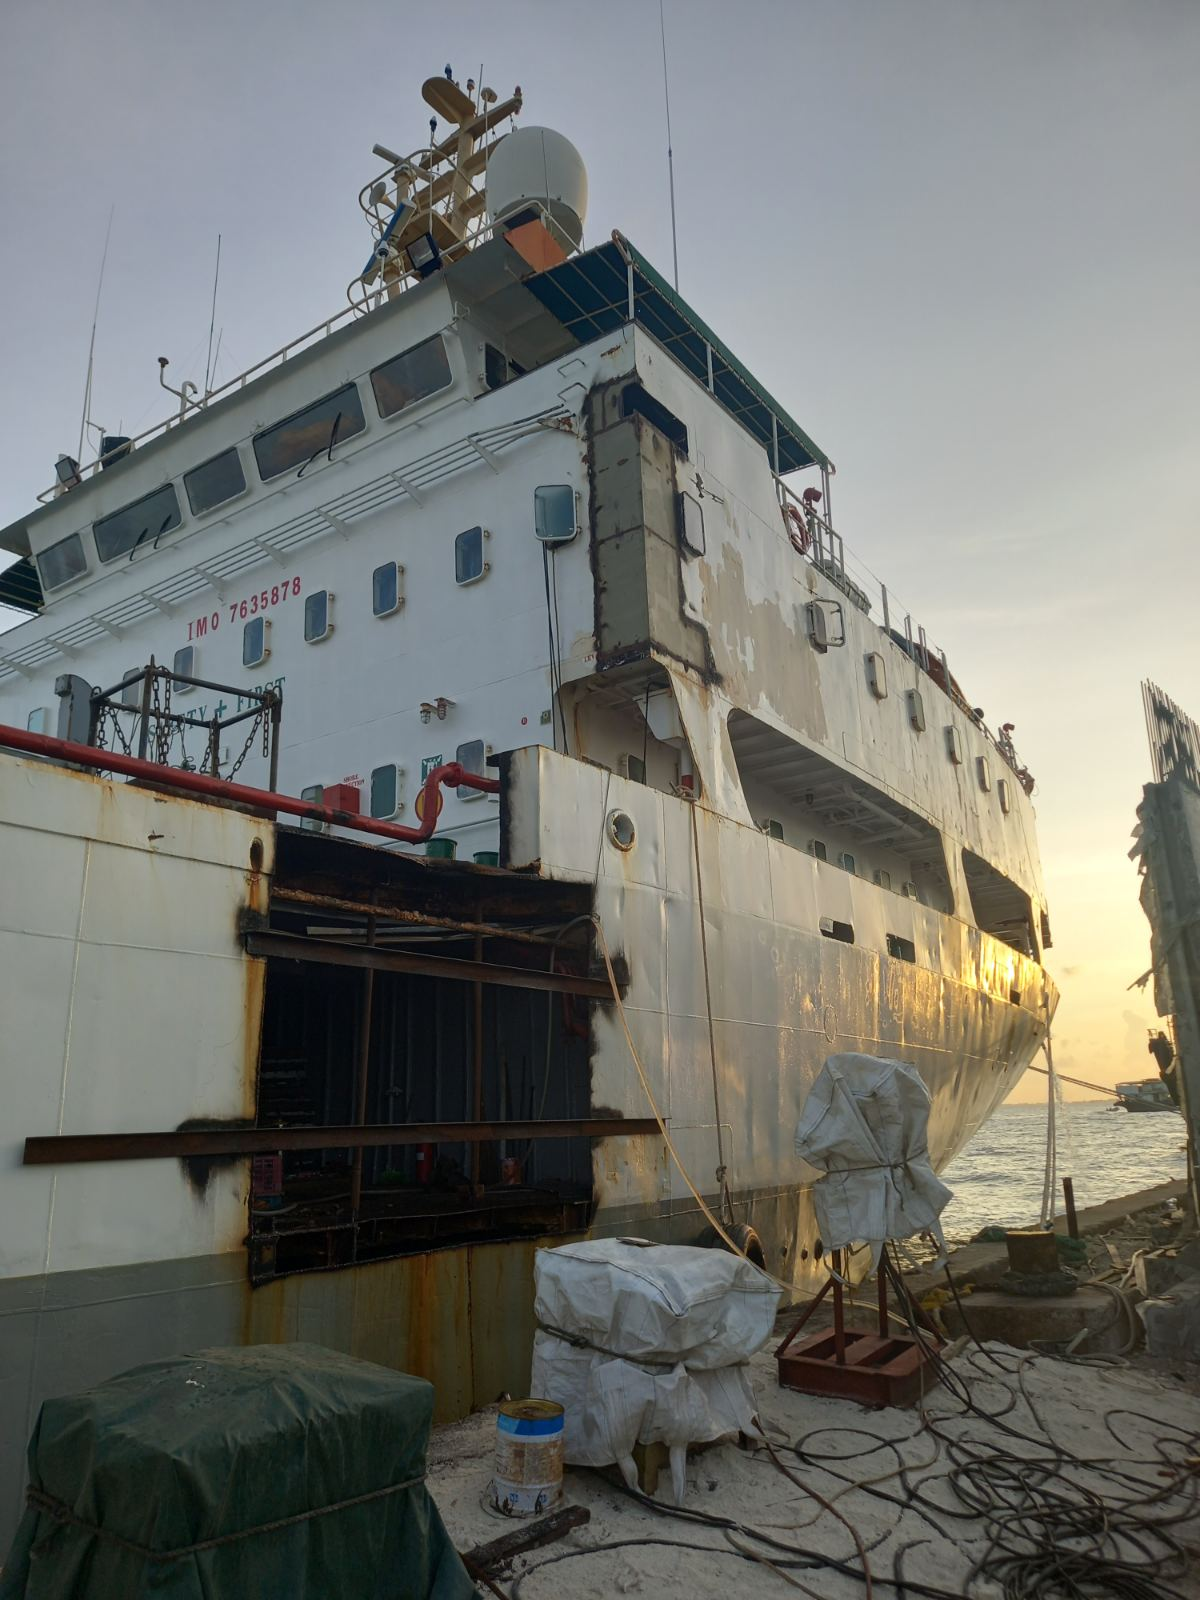 repair work on the Jazeera Reefer shipdiary.com